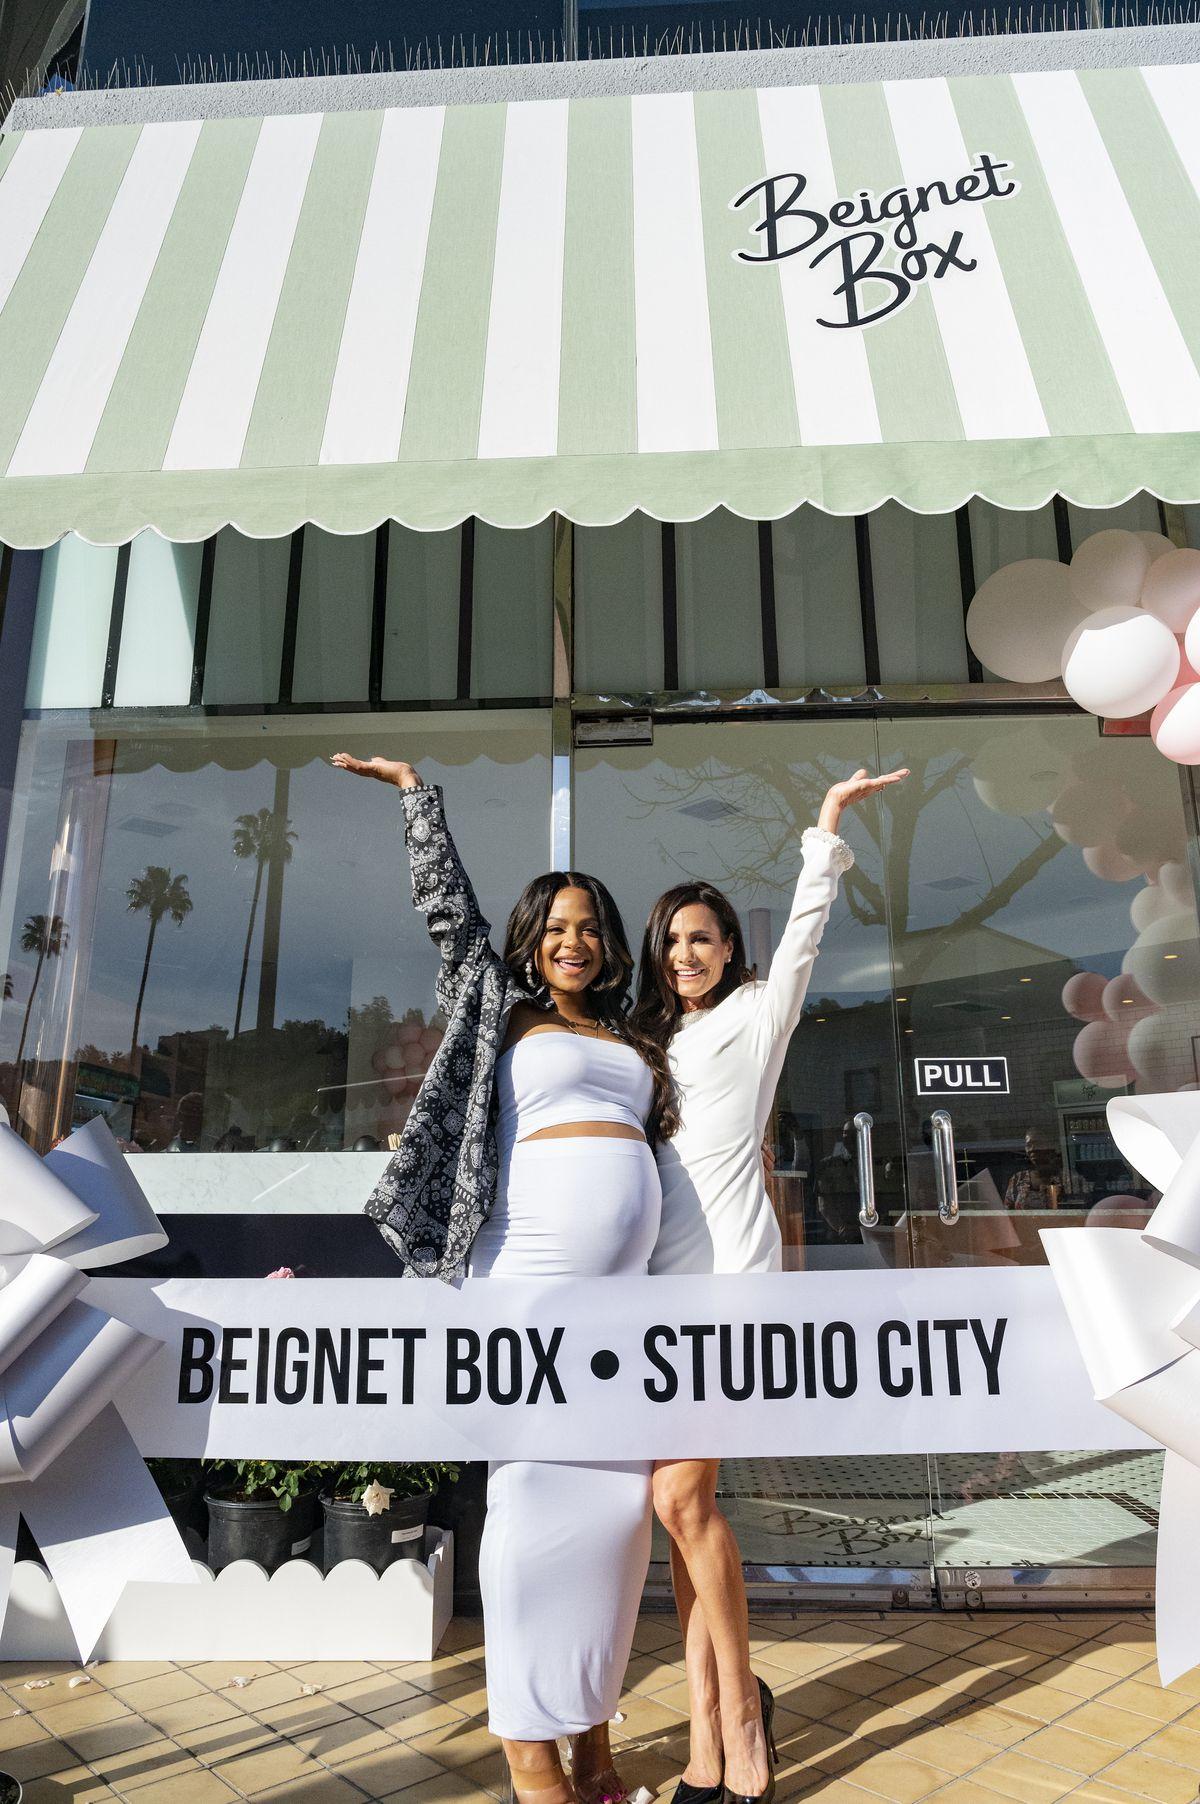 Beignet Box owners Christina Milian and Elizabeth Morris in Studio City, California.